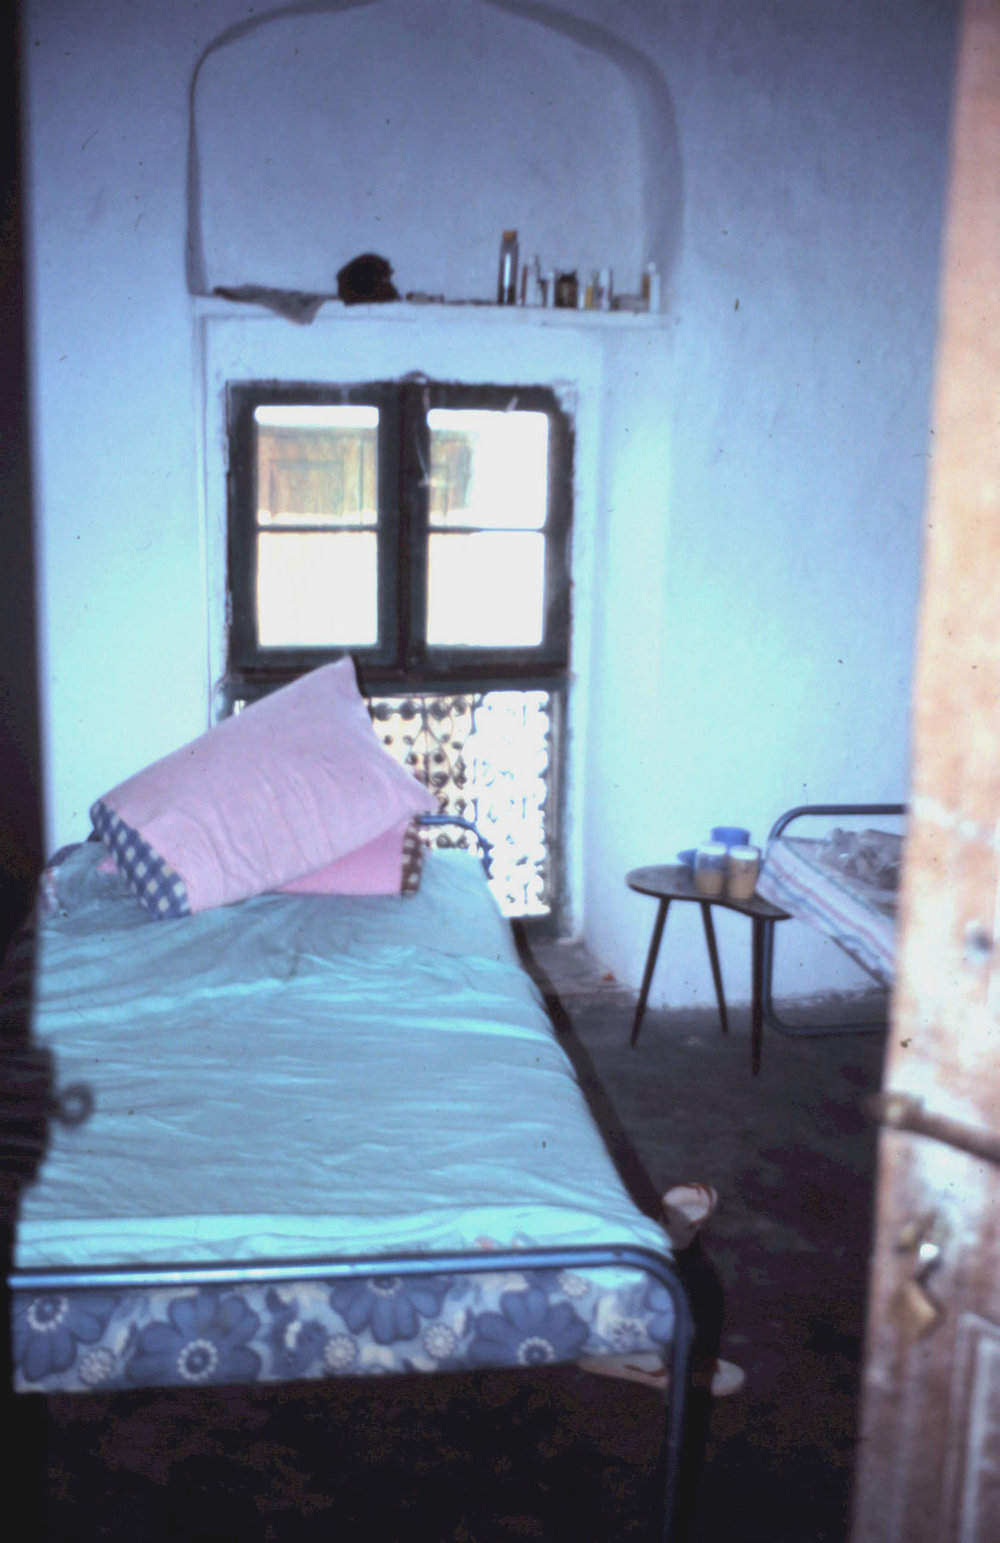 Lamu Hotel Room